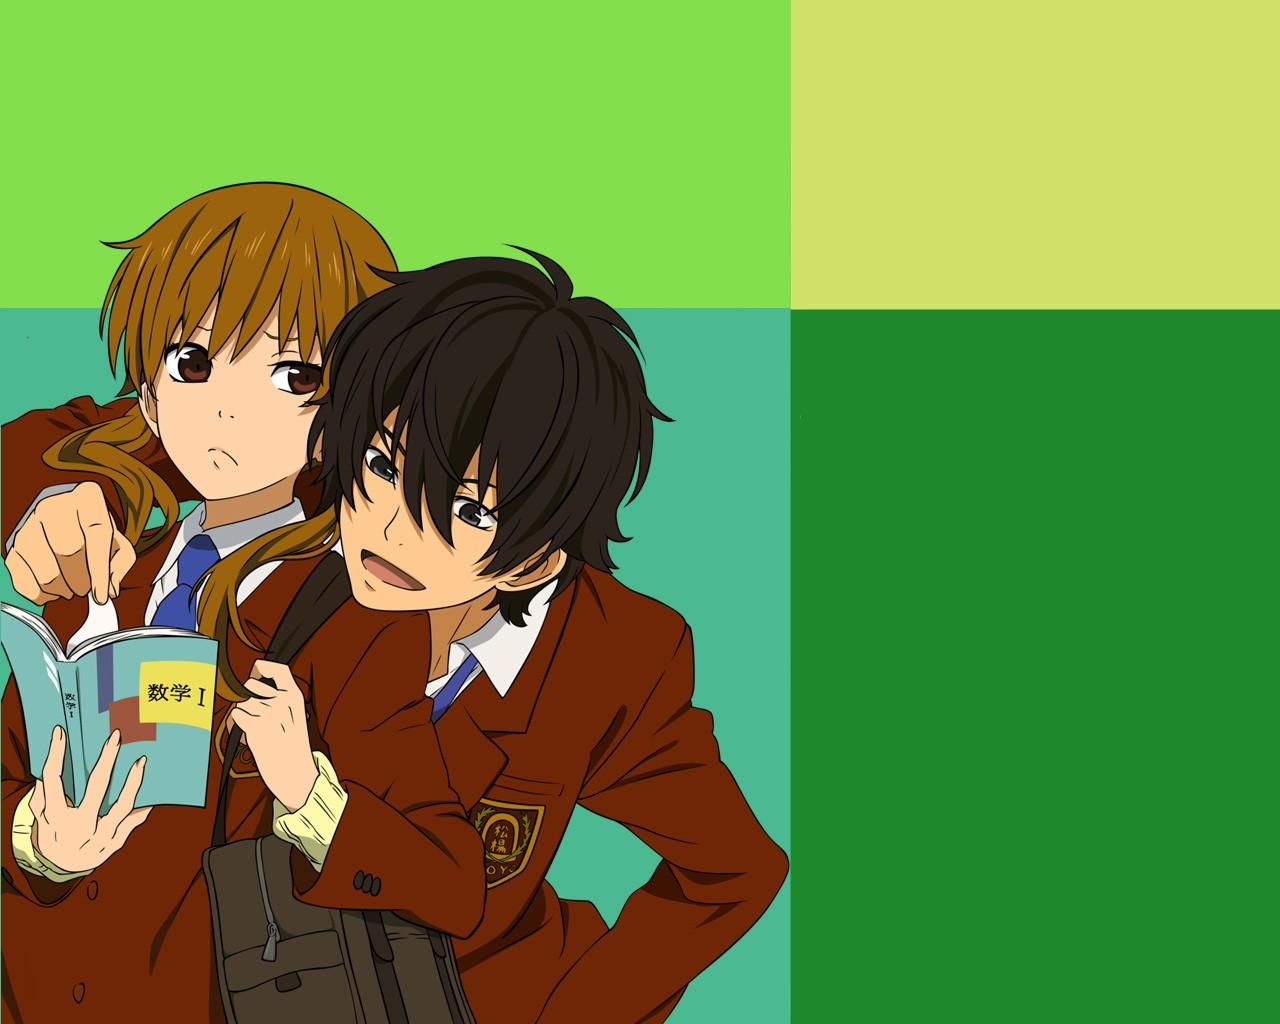 Wallpaper Ilustrasi Anime Gambar Kartun Orang Tonari No